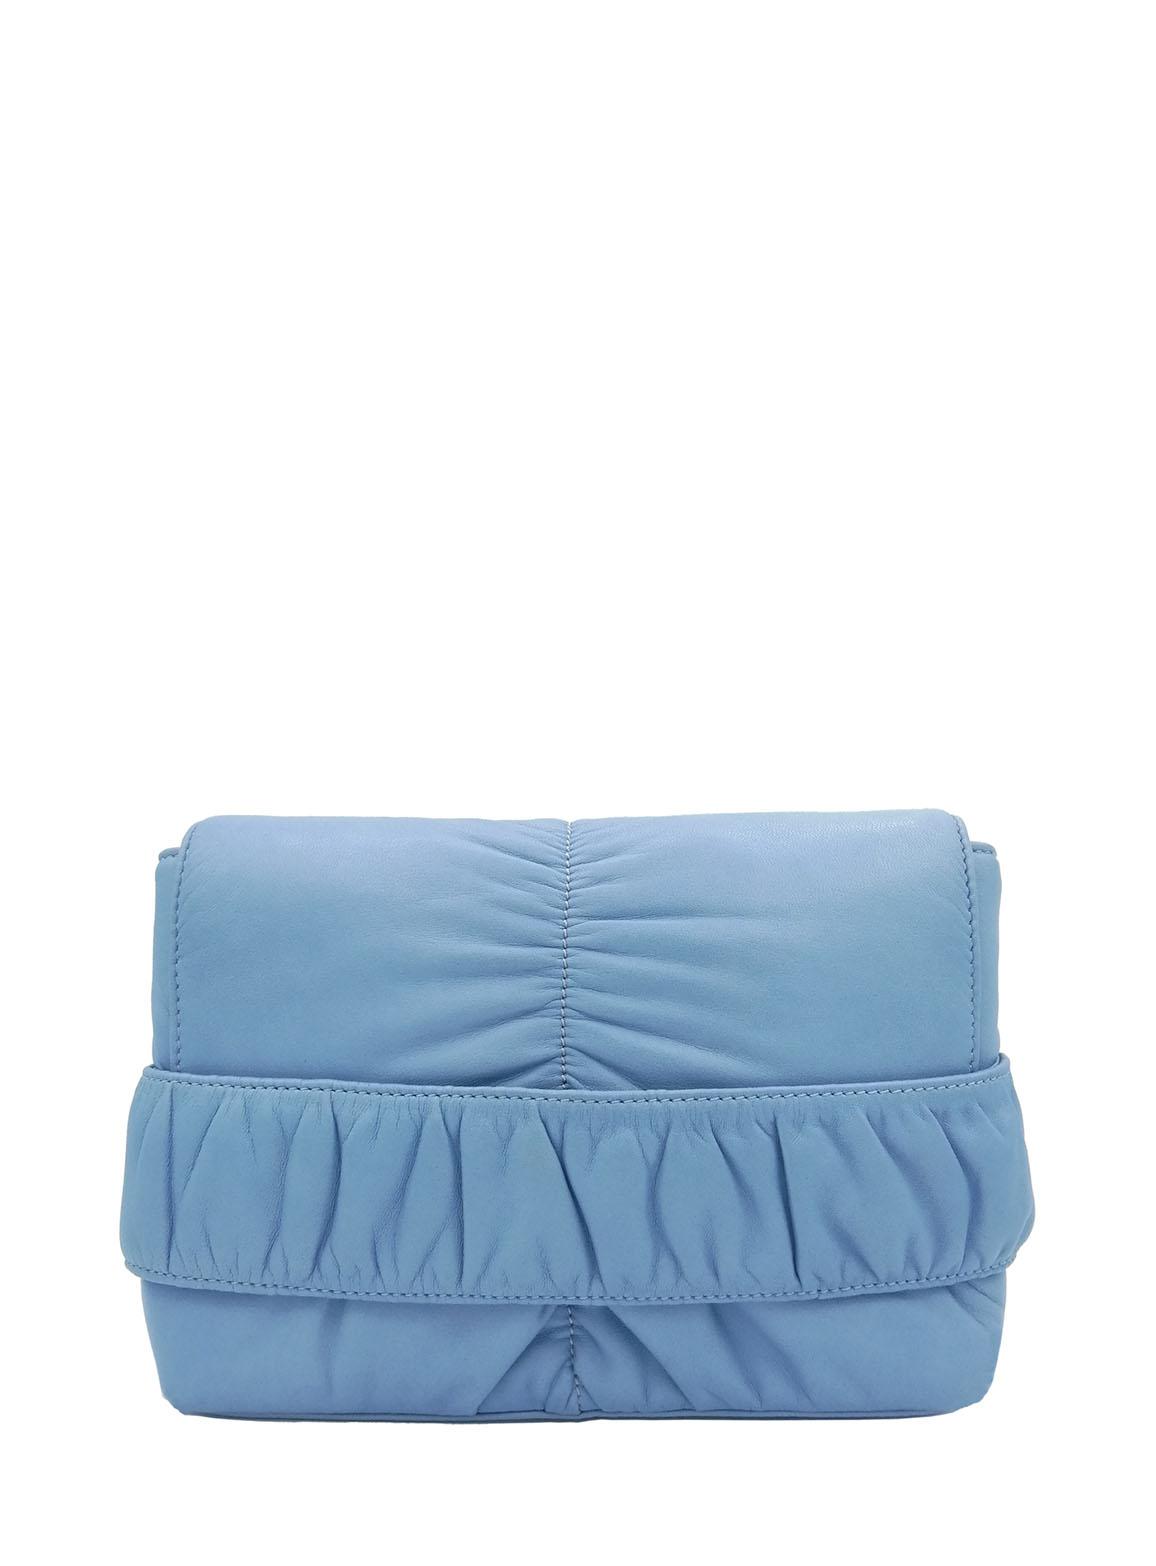 Apolline Bag light blue